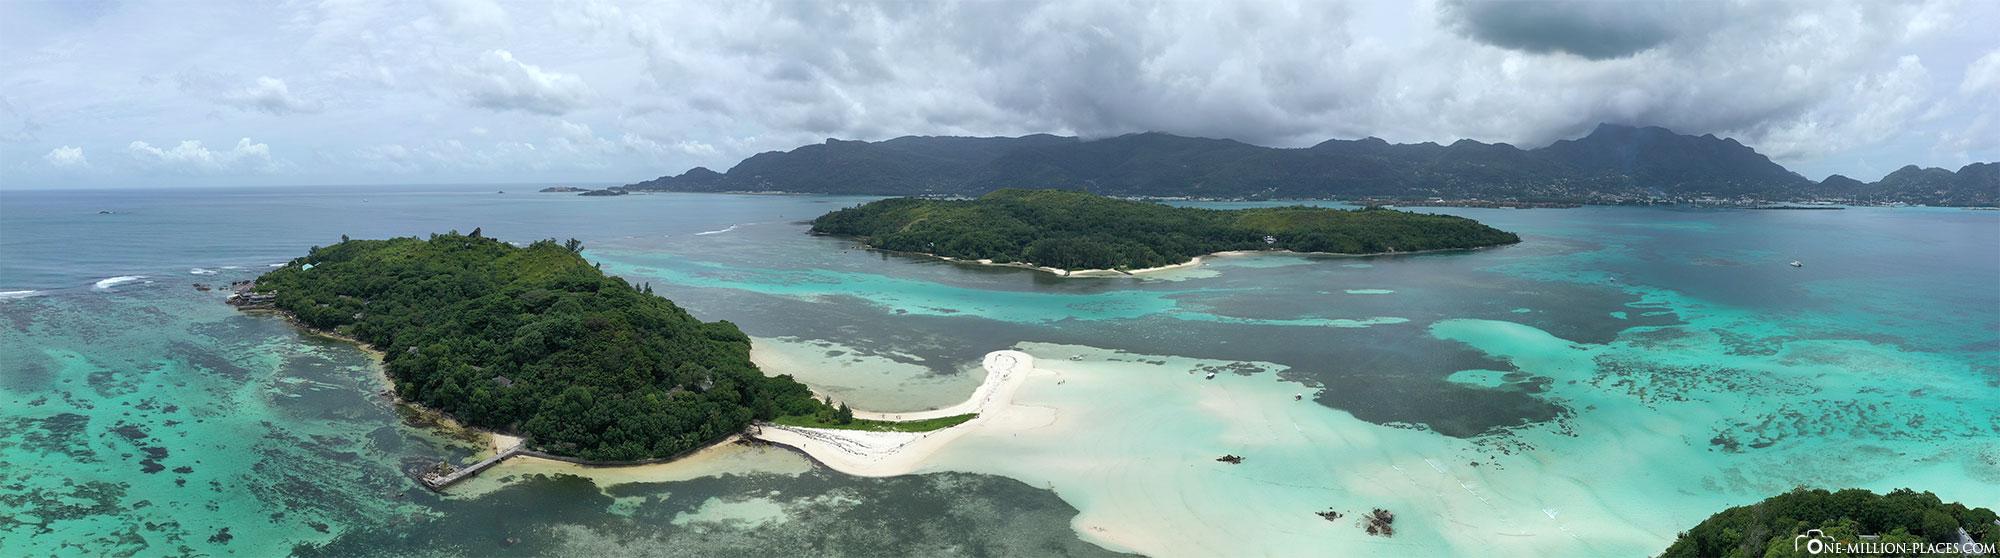 Panoramic image, Sainte Anne Marine National Park , Mahé, Seychelles, Drone shot, Tour, Travelreport